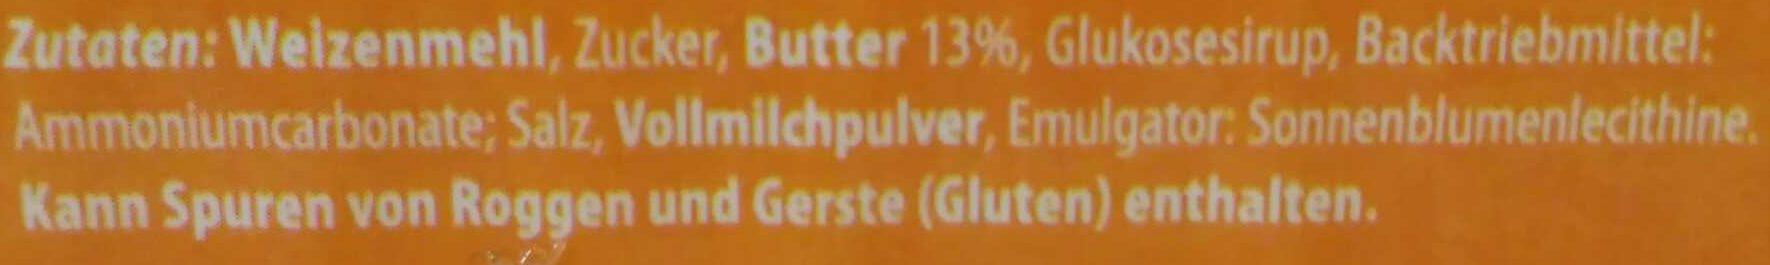 Butterkeks - Inhaltsstoffe